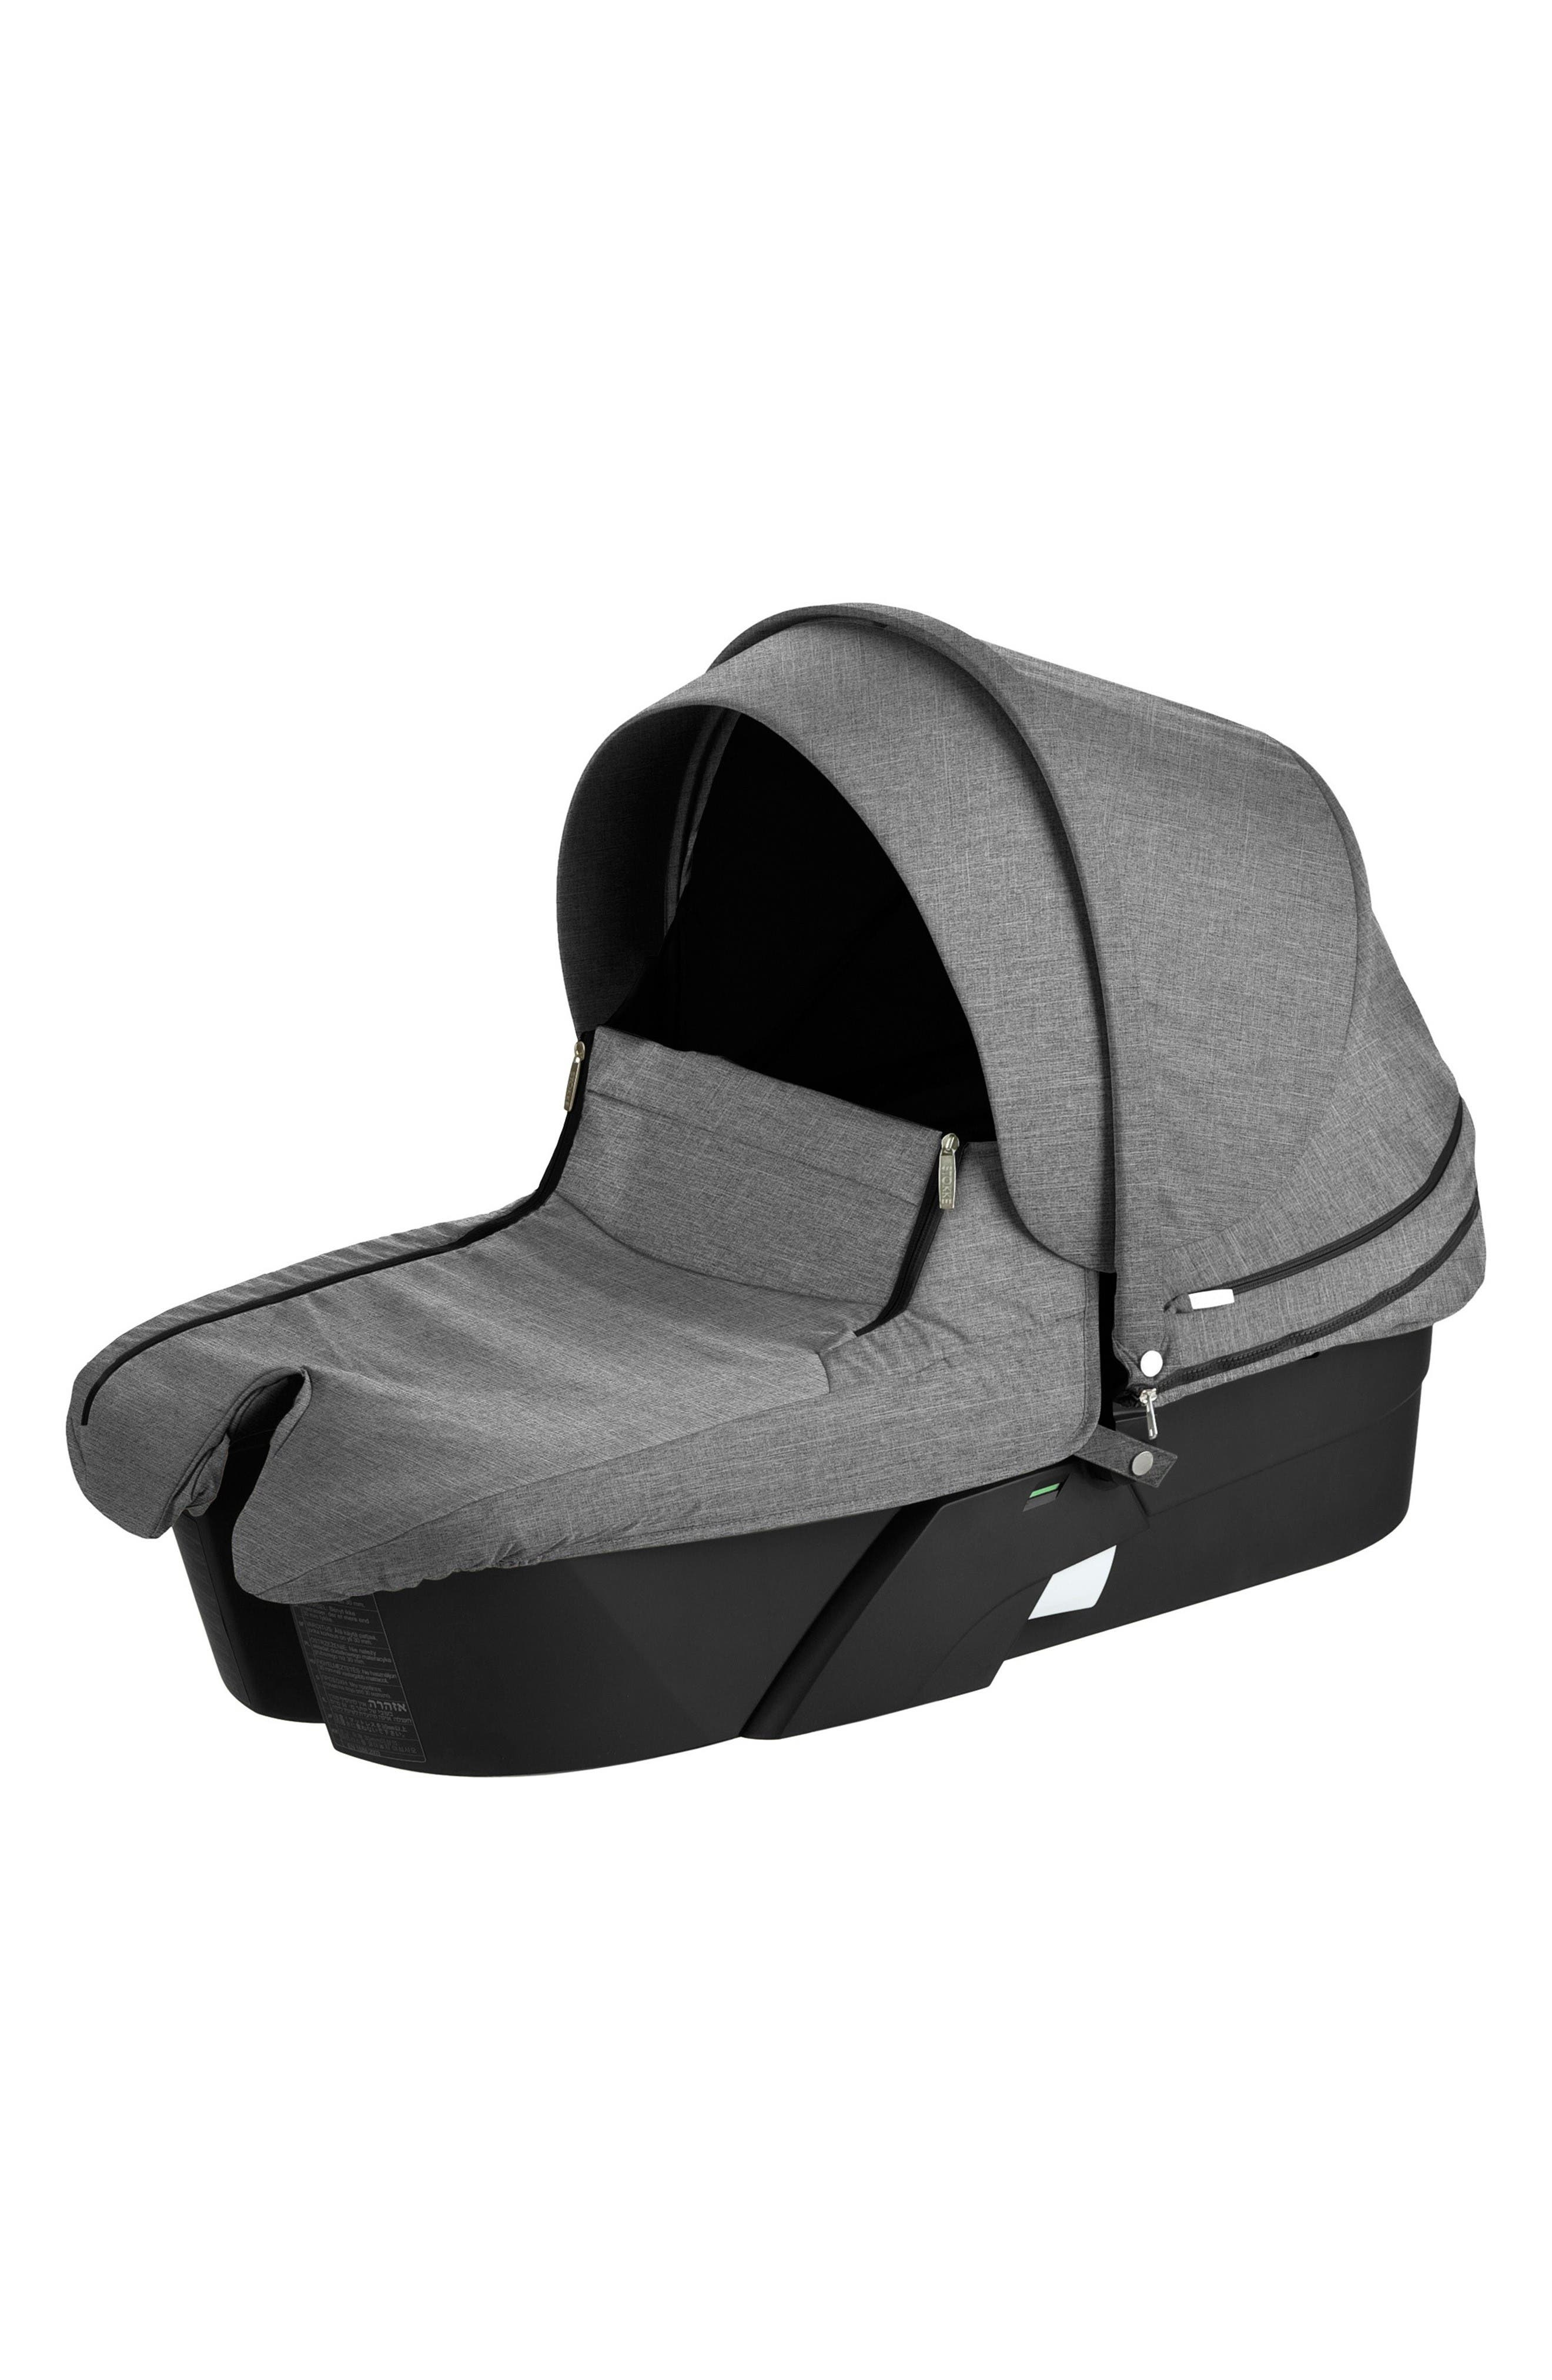 Main Image - Stokke Xplory® Stroller Carry Cot